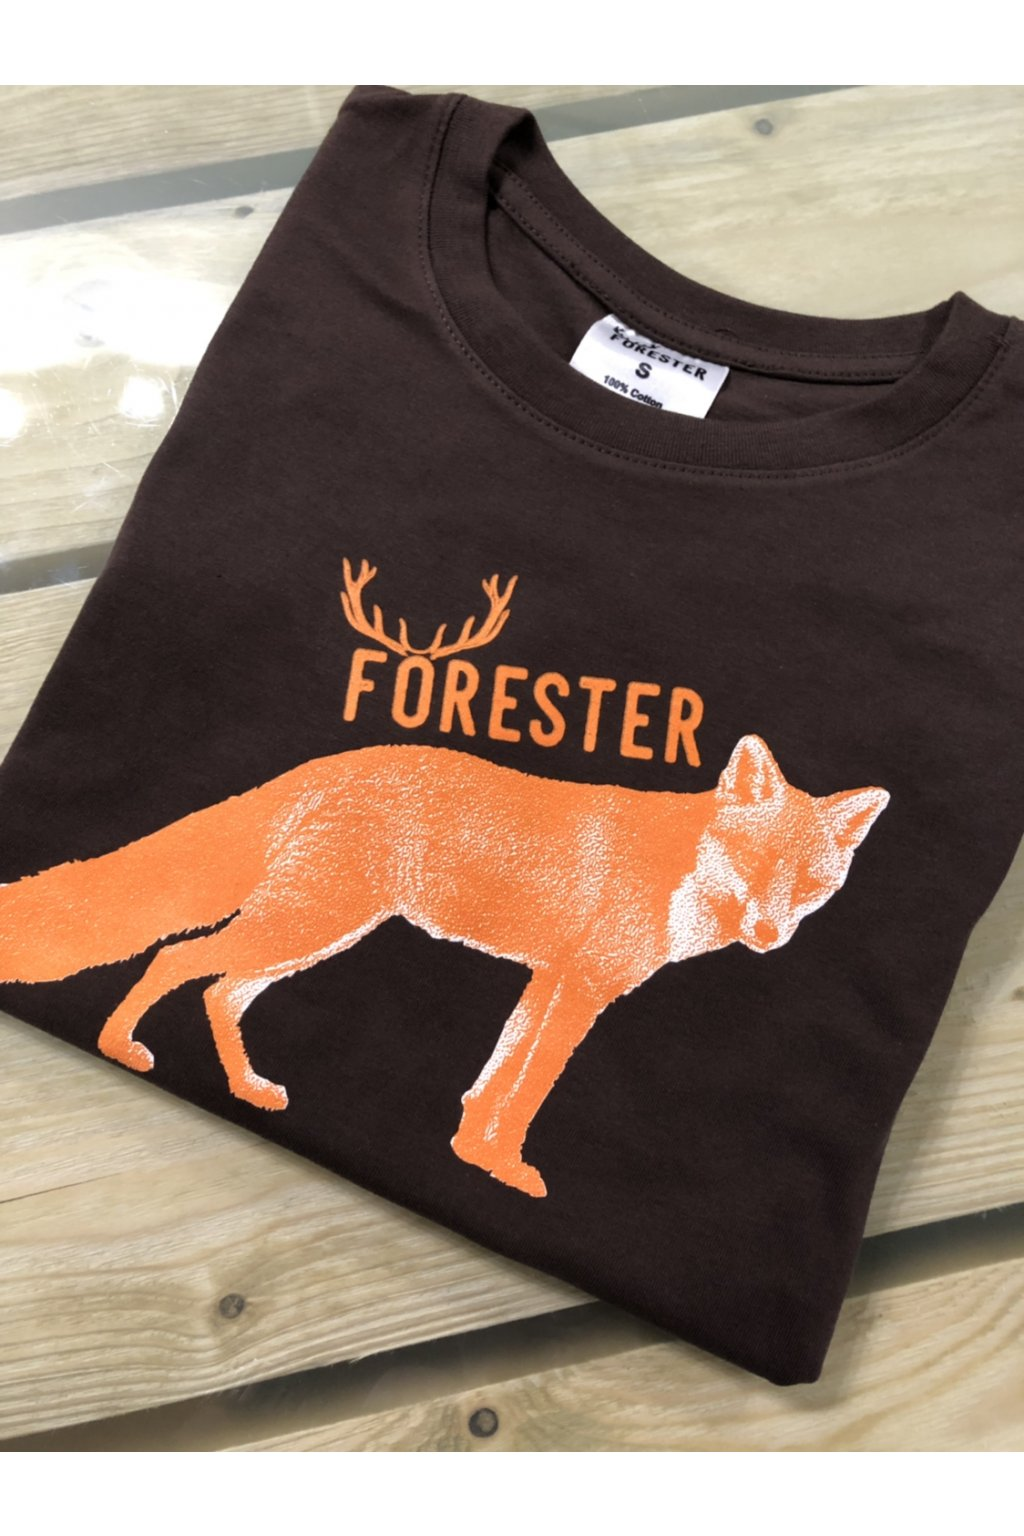 FORESTER - tričko dámské hn.liška